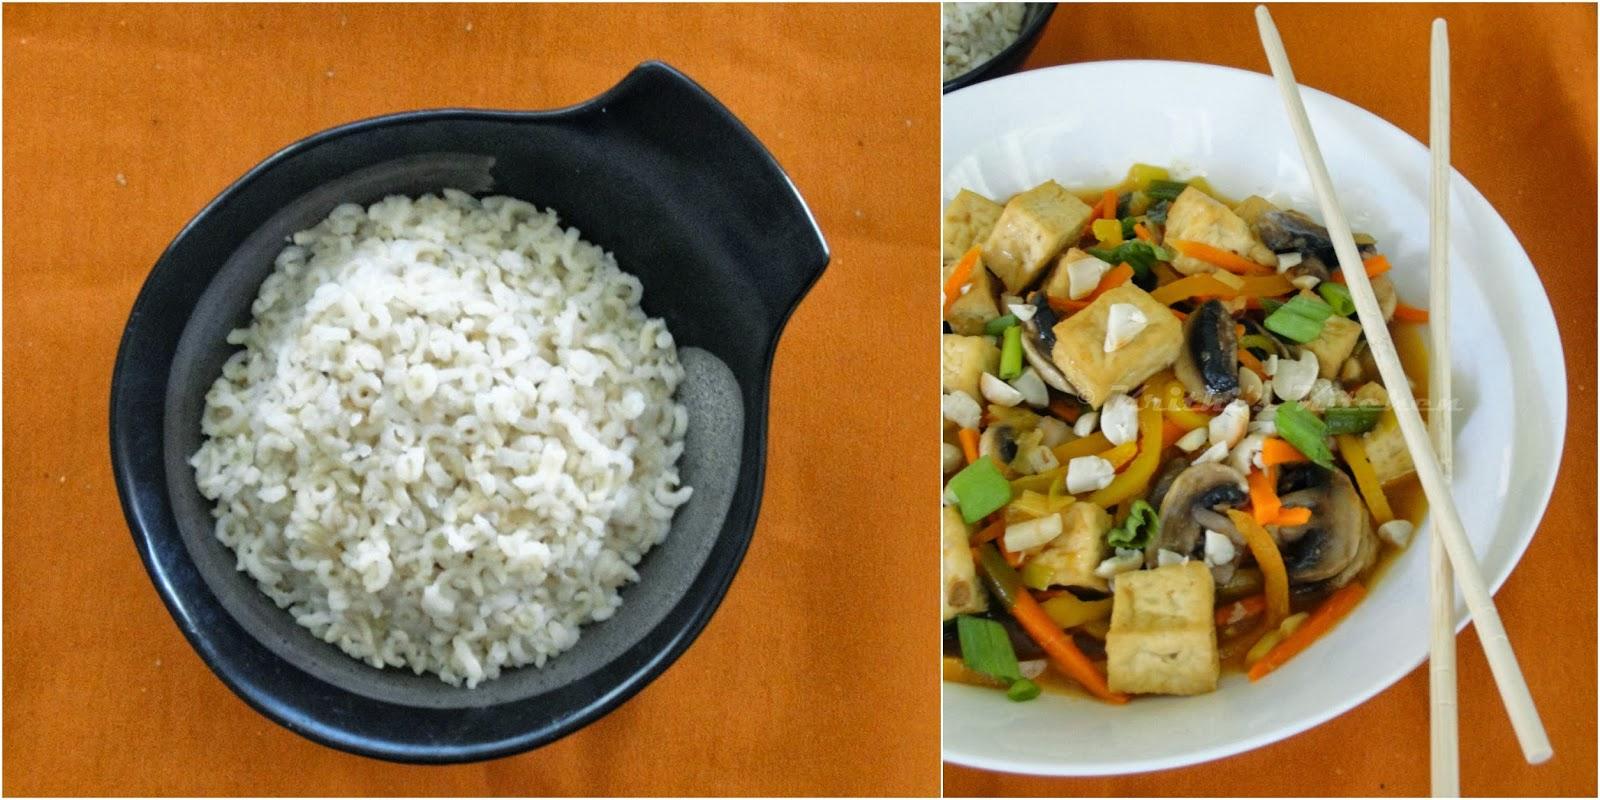 Krithi S Kitchen Szechuan Style Tofu And Mushroom With